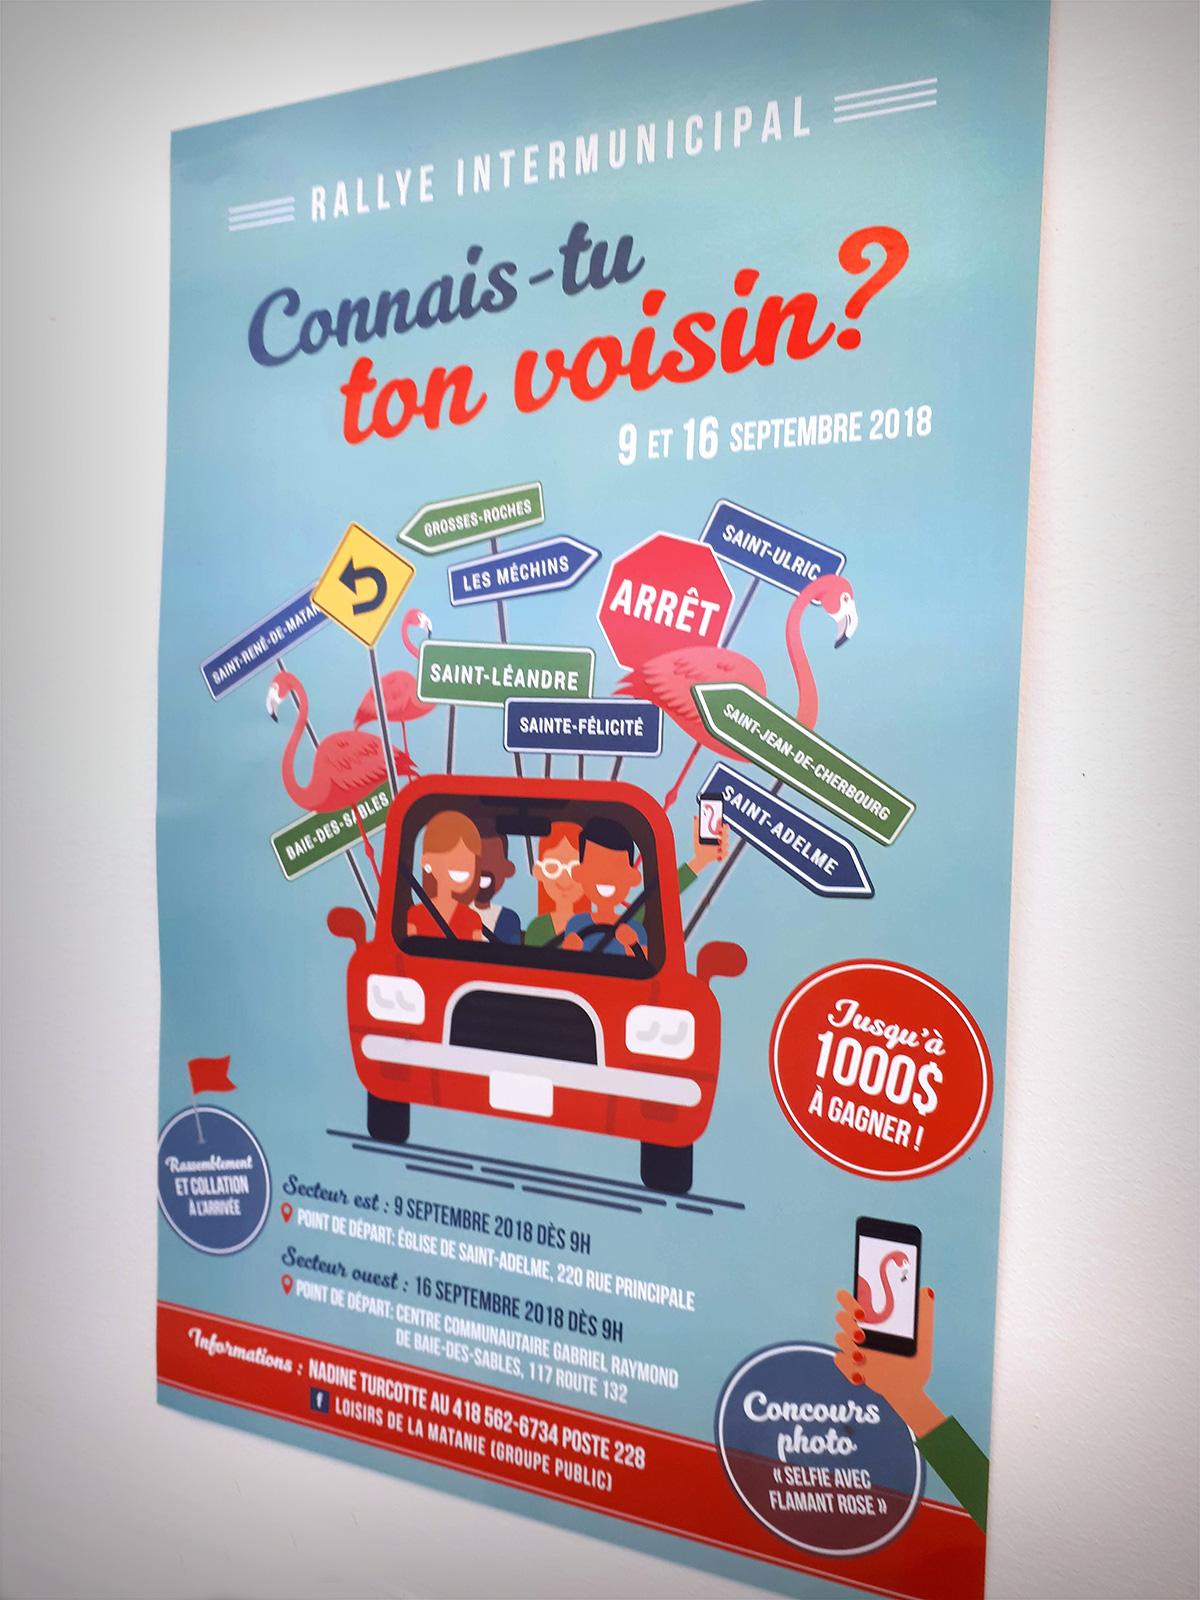 Conception d'une affiche «Rallye intermunicipal»